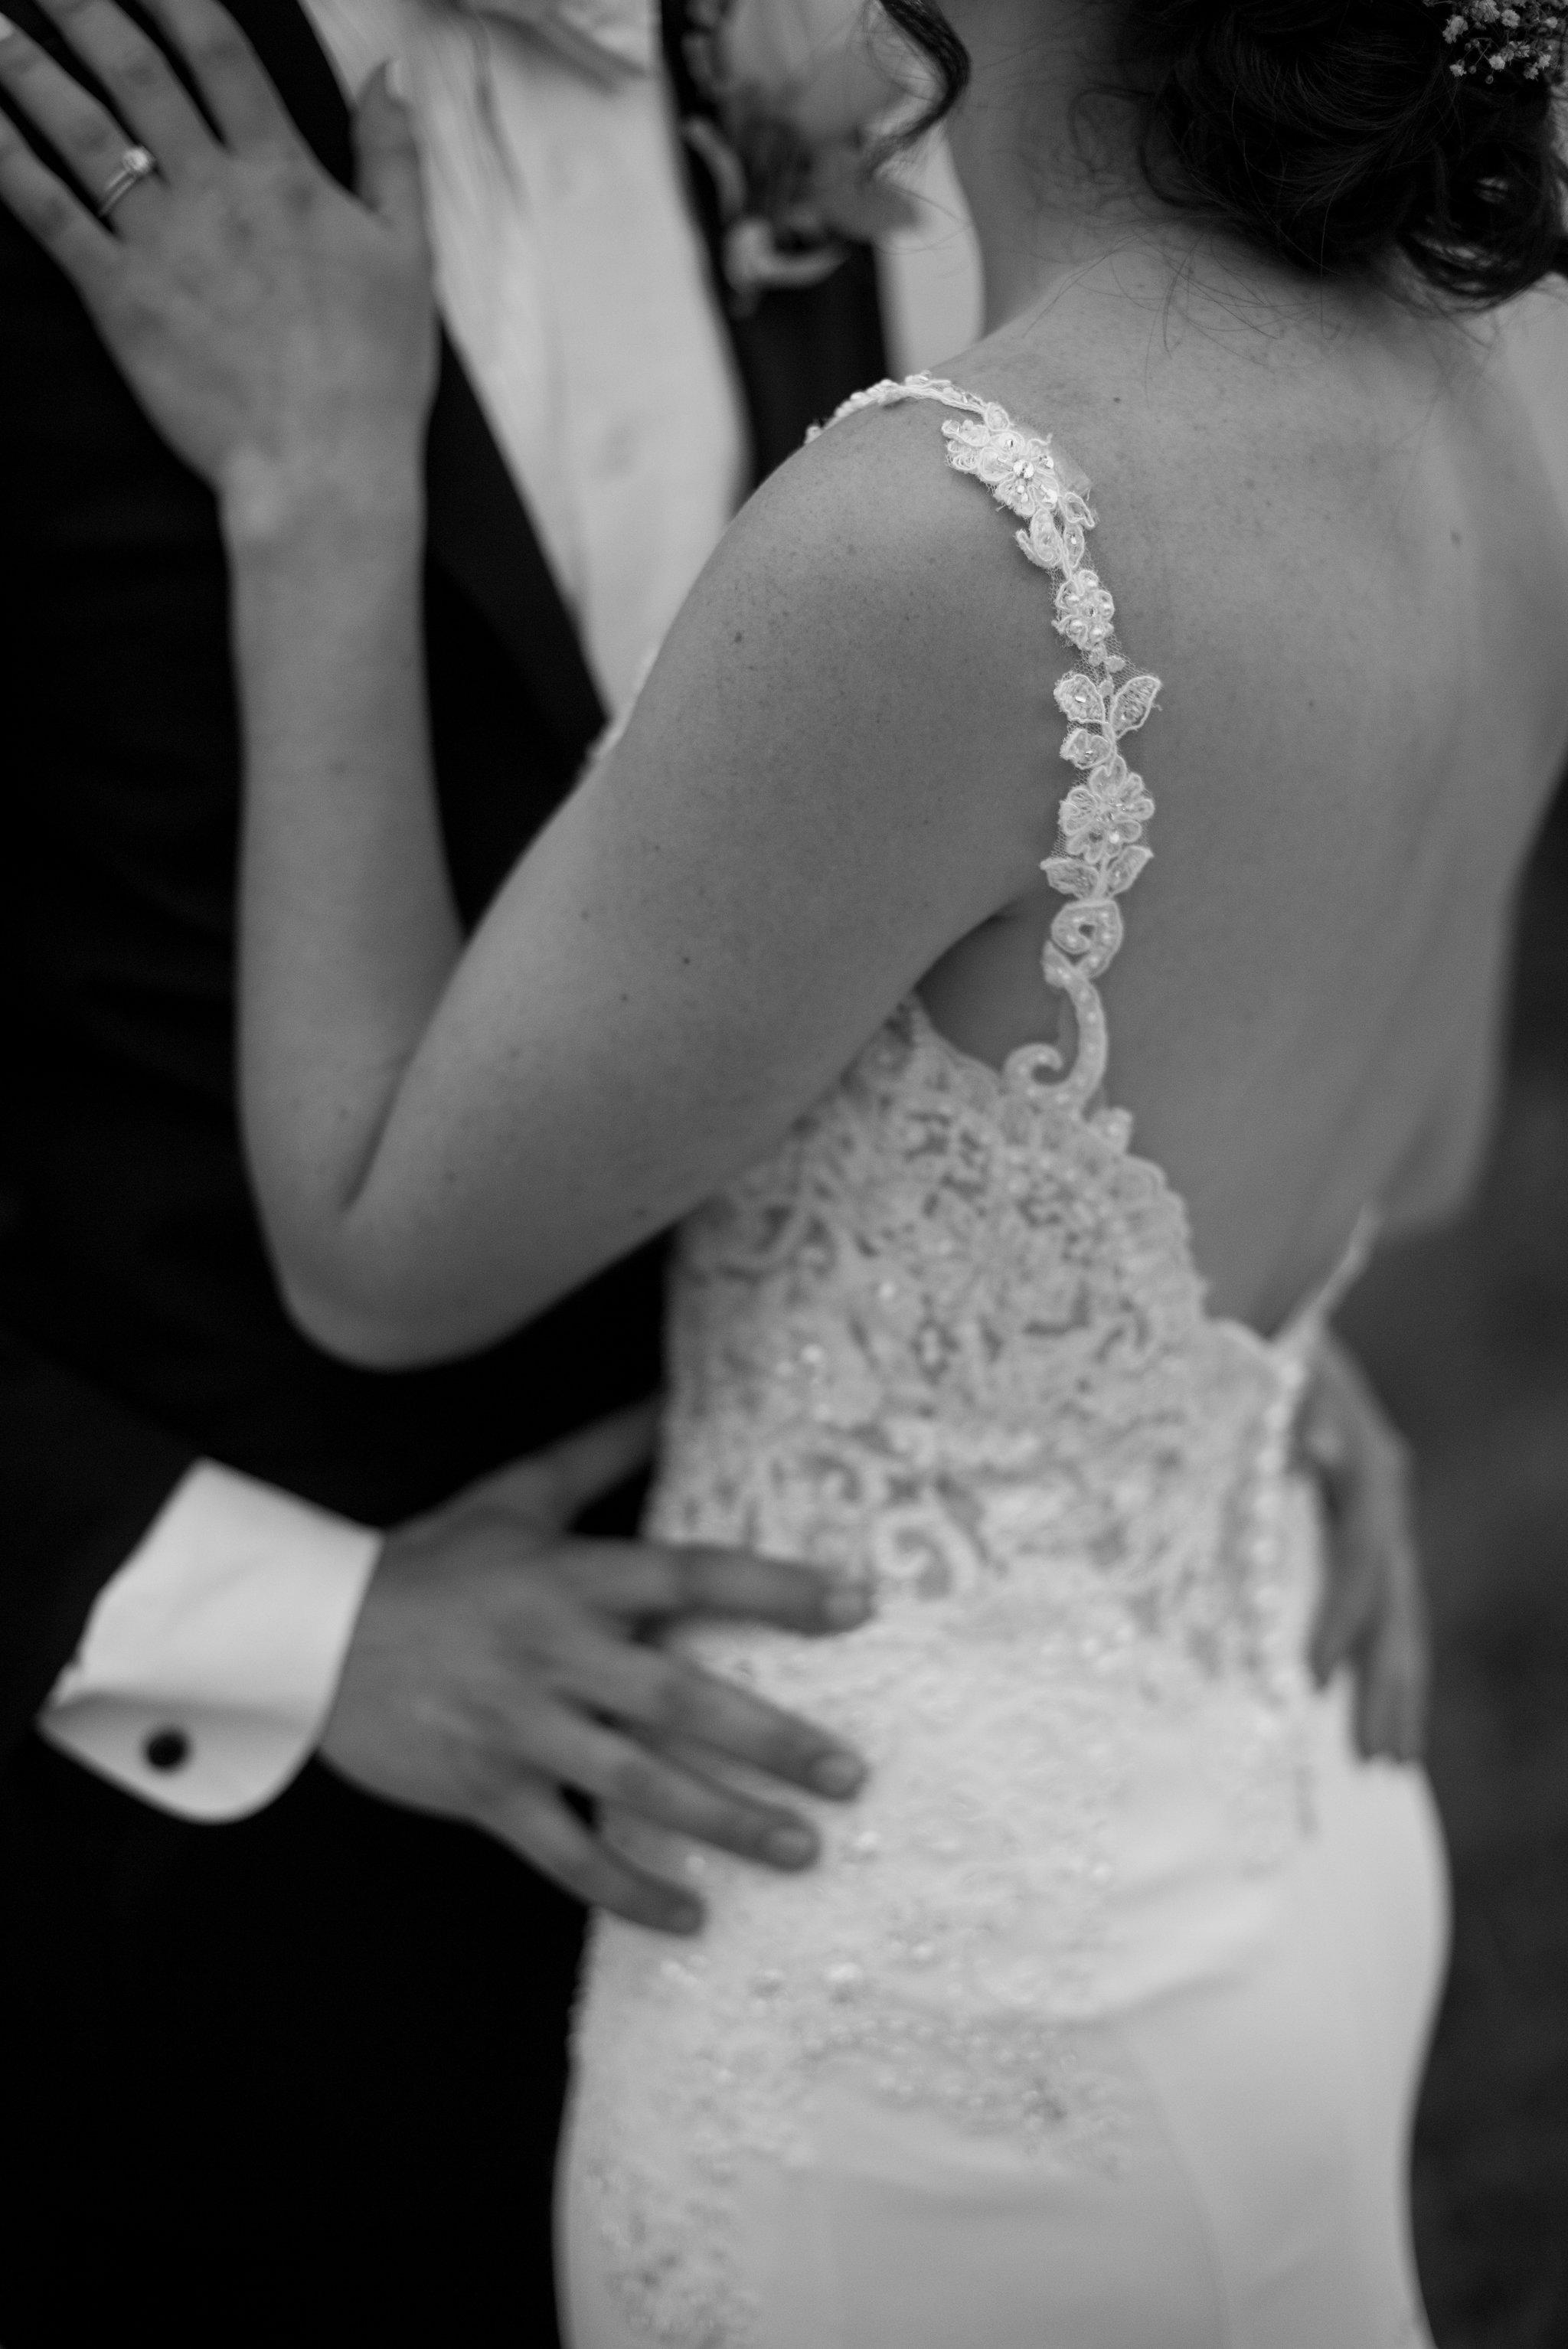 st-augustine-wedding-photographer-sarah-annay-photography.jpg75.jpg